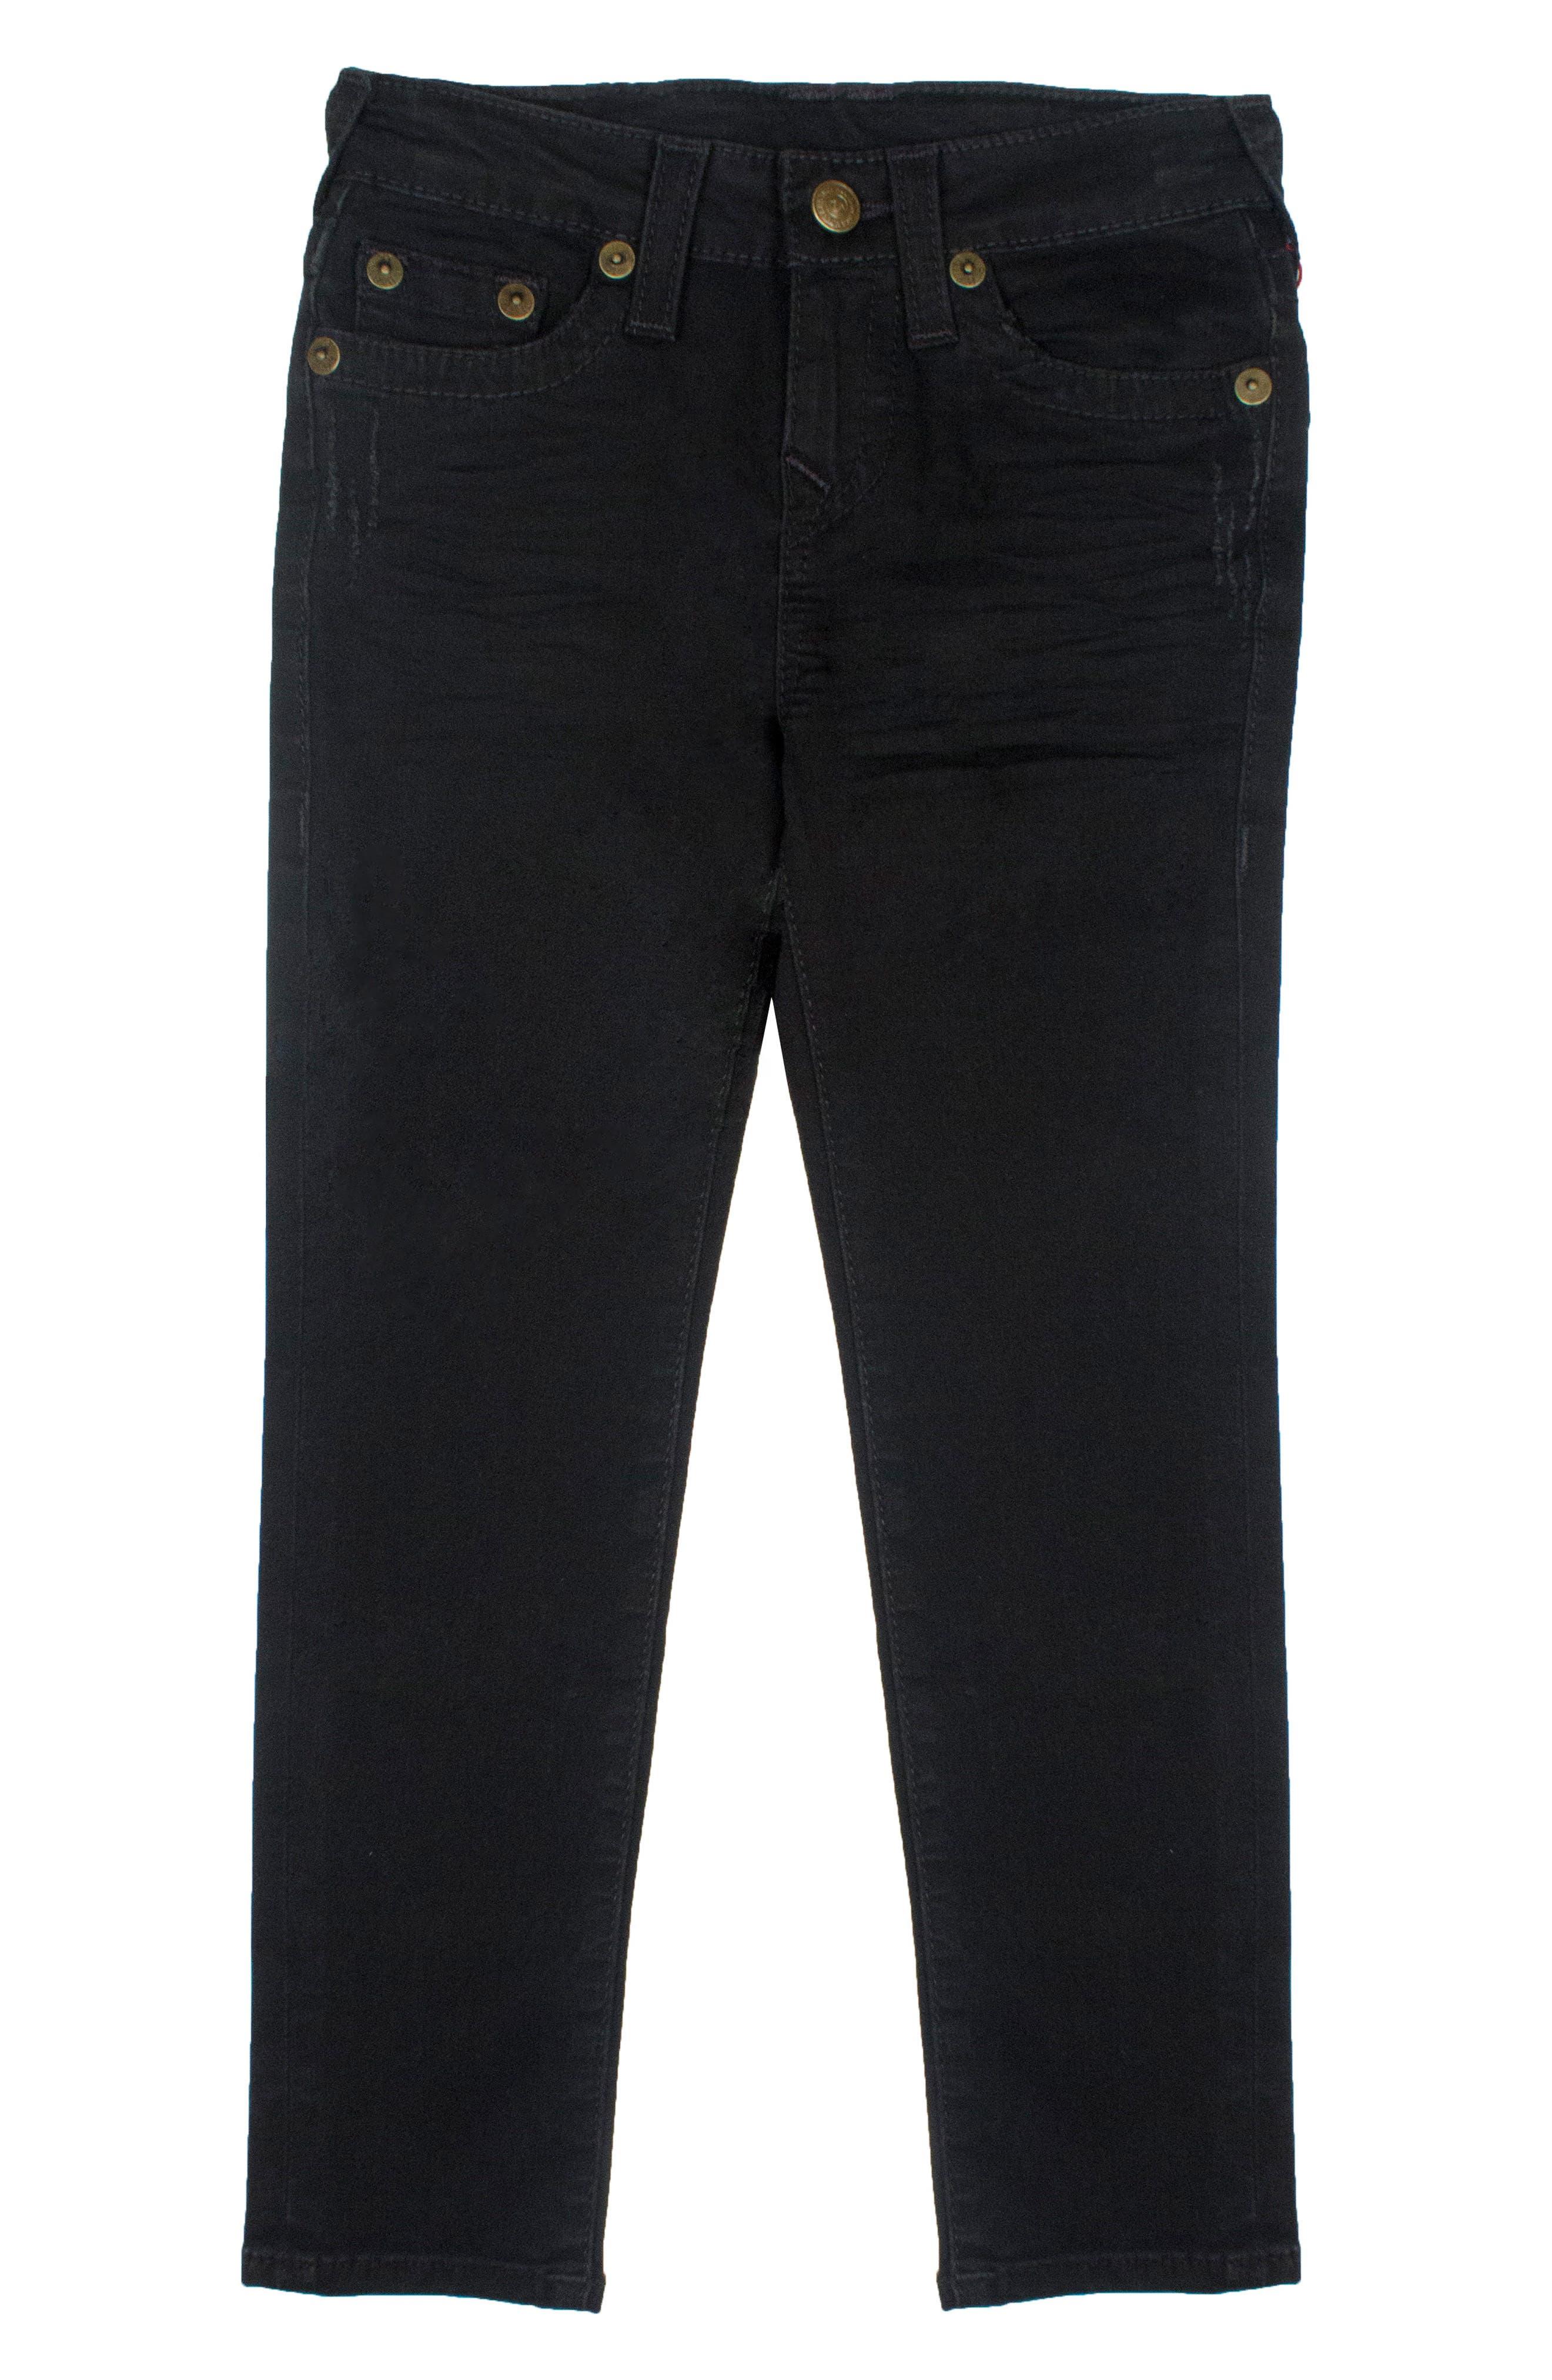 Alternate Image 1 Selected - True Religion Brand Jeans Geno Single End Jeans (Toddler Boys & Little Boys)